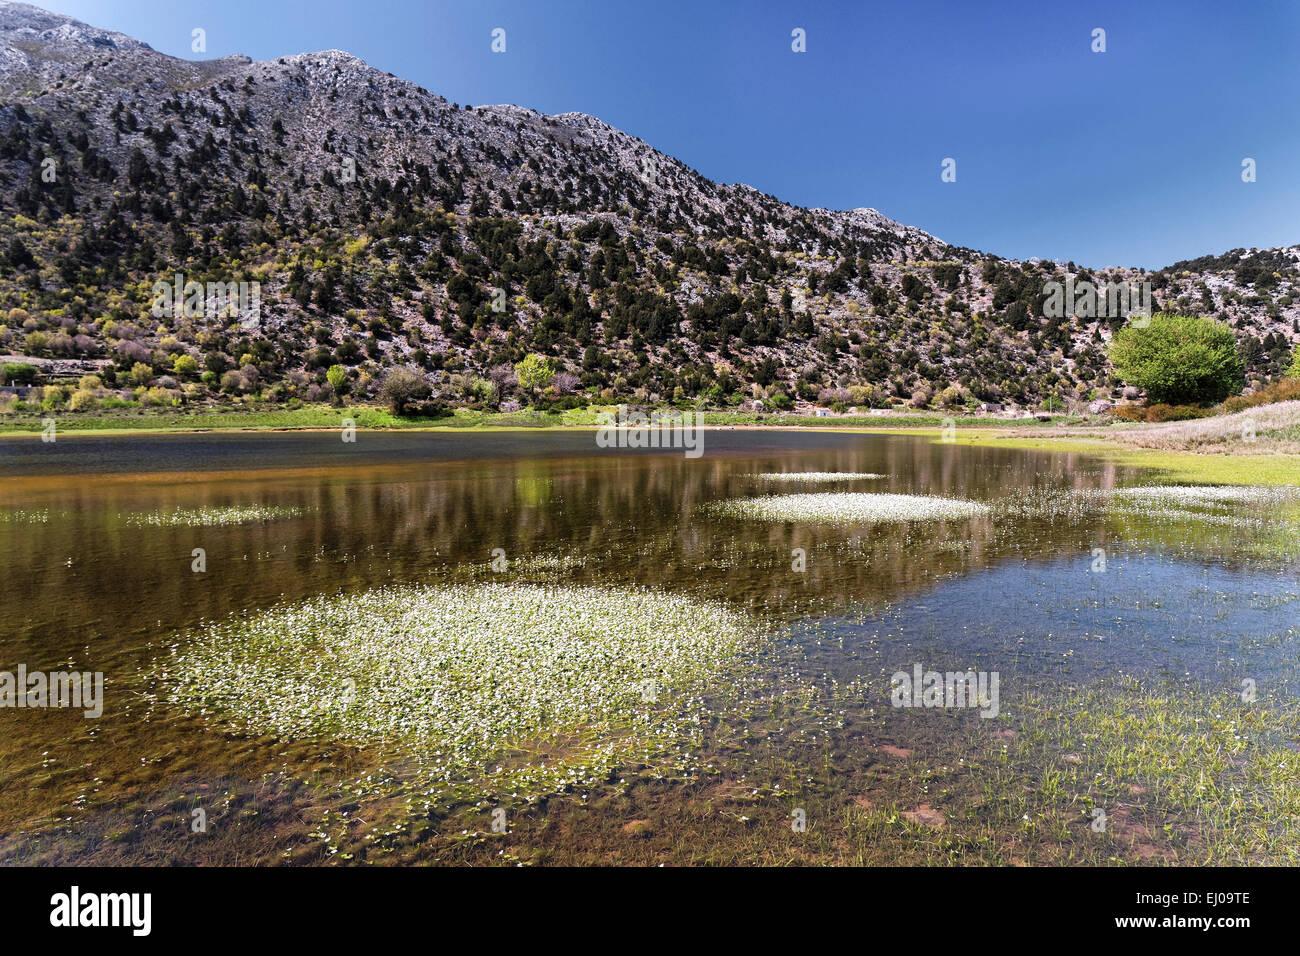 Spring, Greece, Europe, crowfoot, plateau, island, isle, Crete, Lefka Ori, Mediterranean, nature, Omalos, province - Stock Image